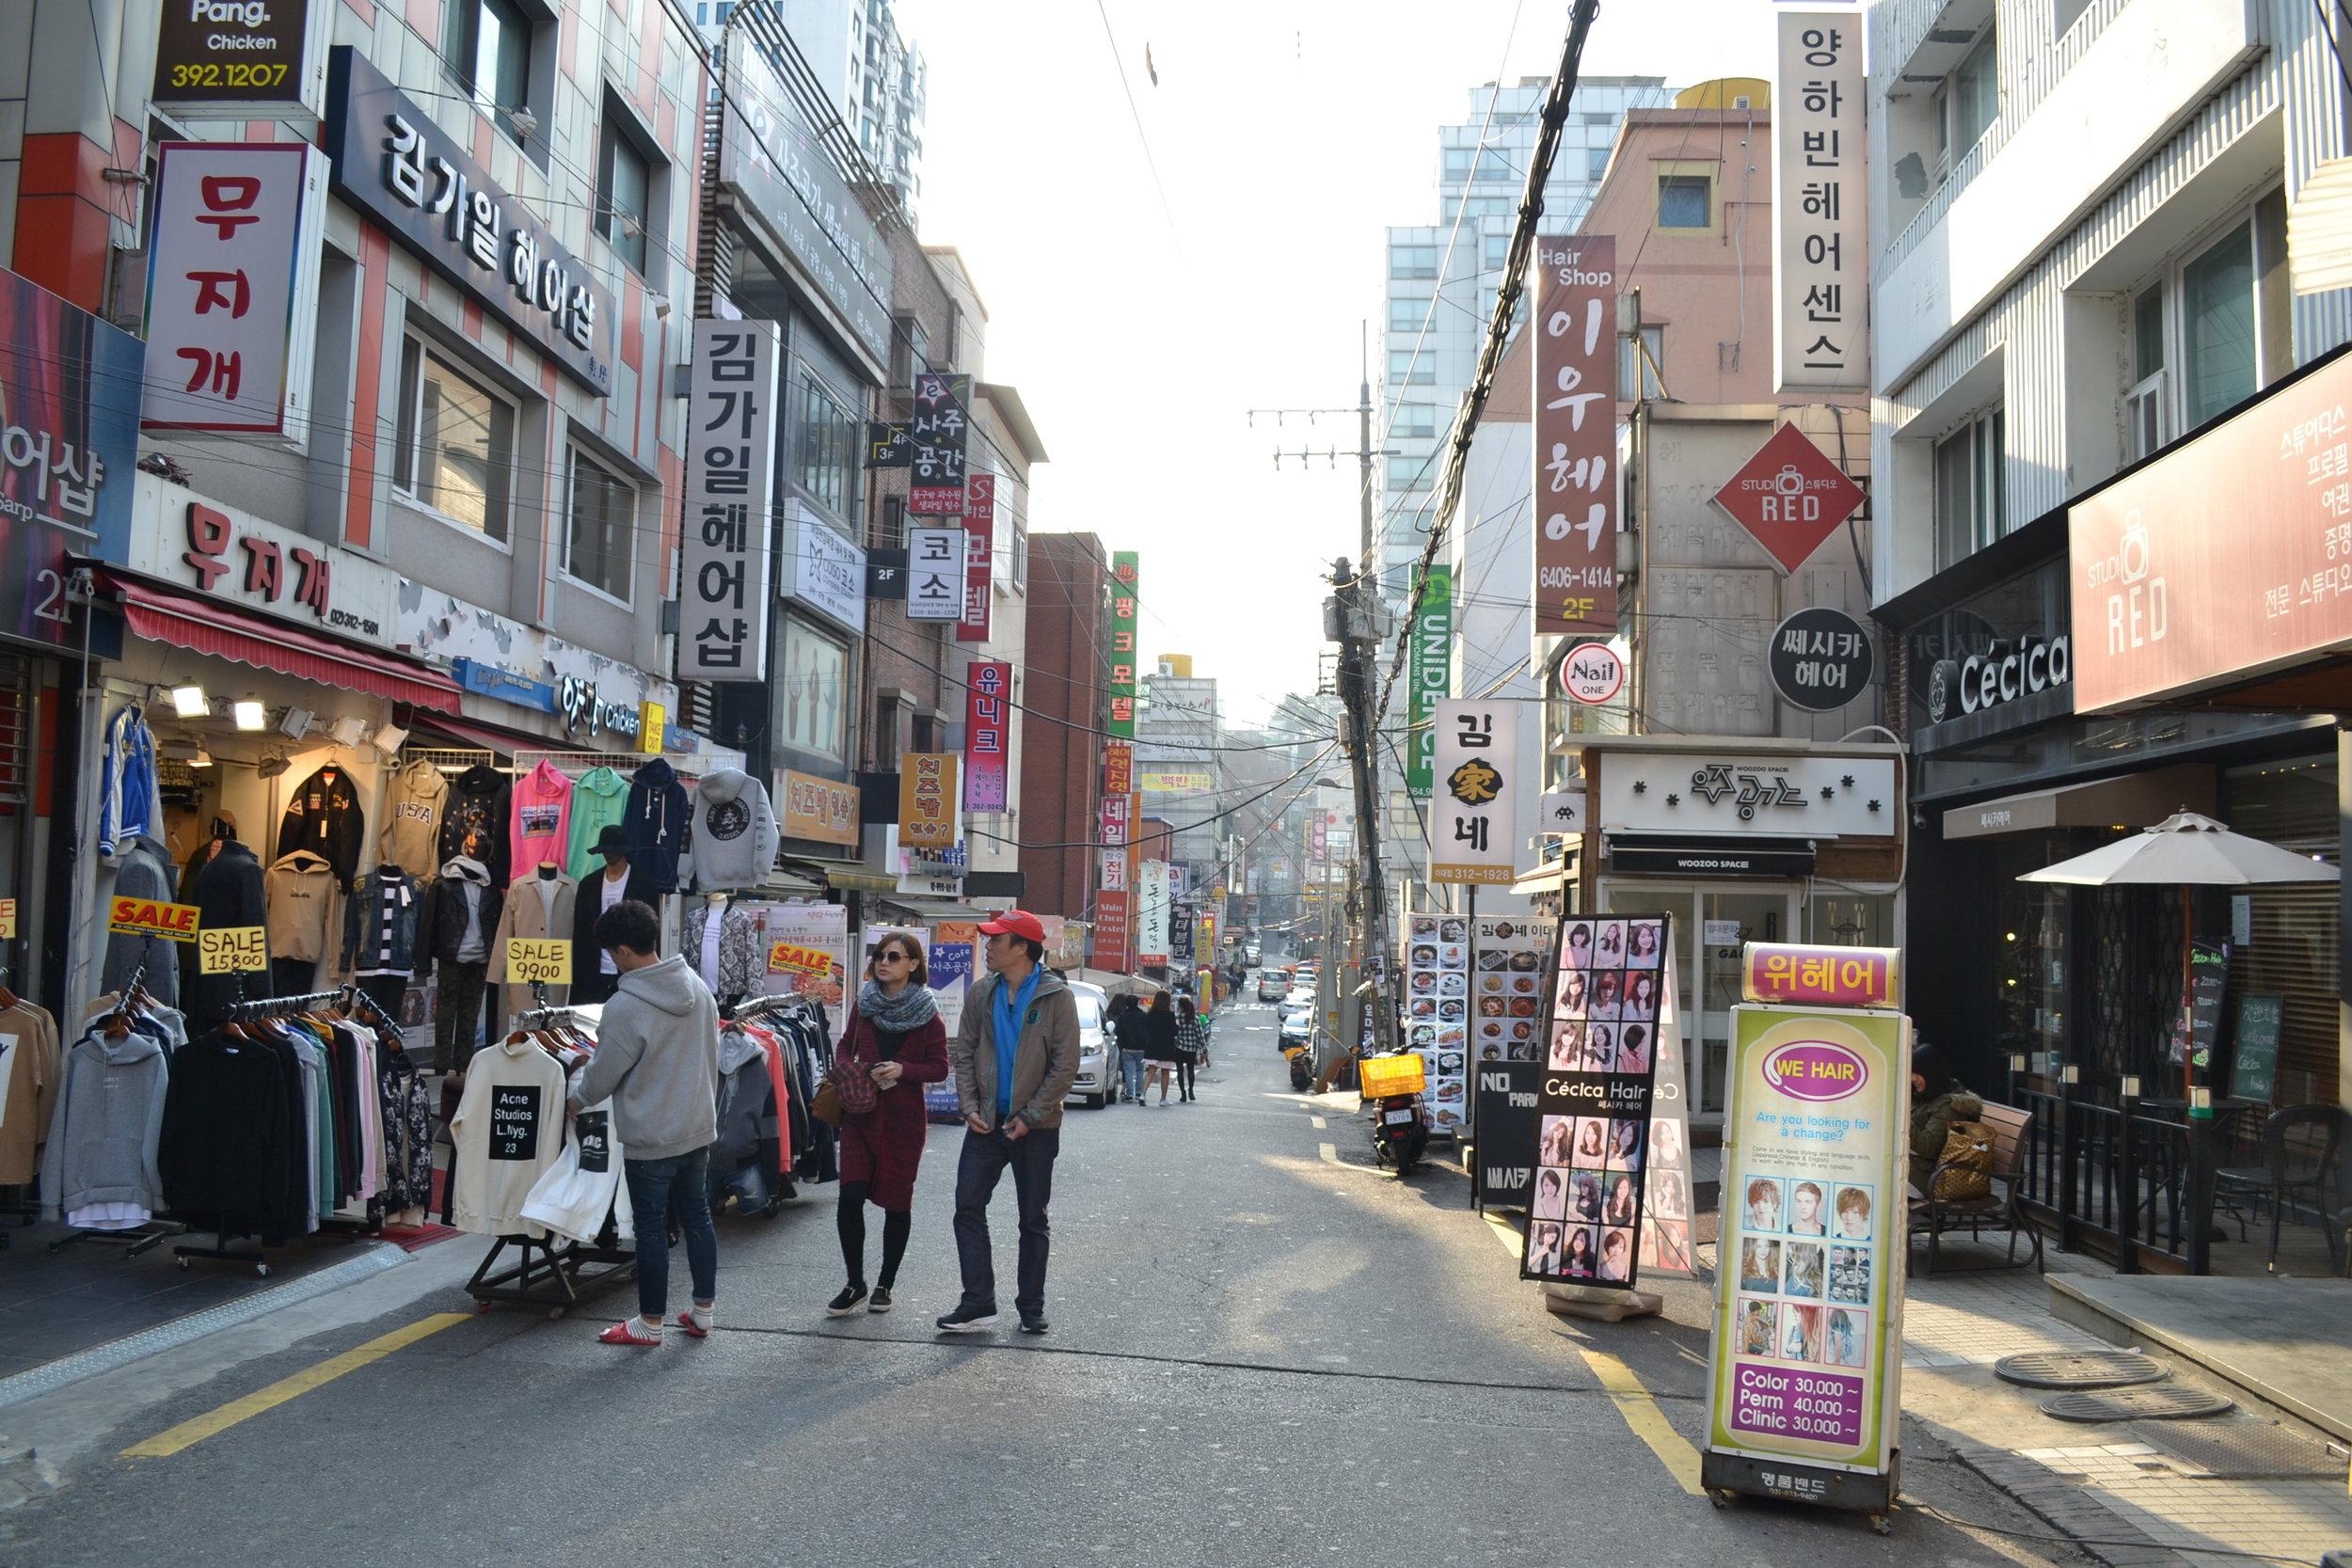 Things to do in Korea - Ewha Women's University, Sinchon, Seoul